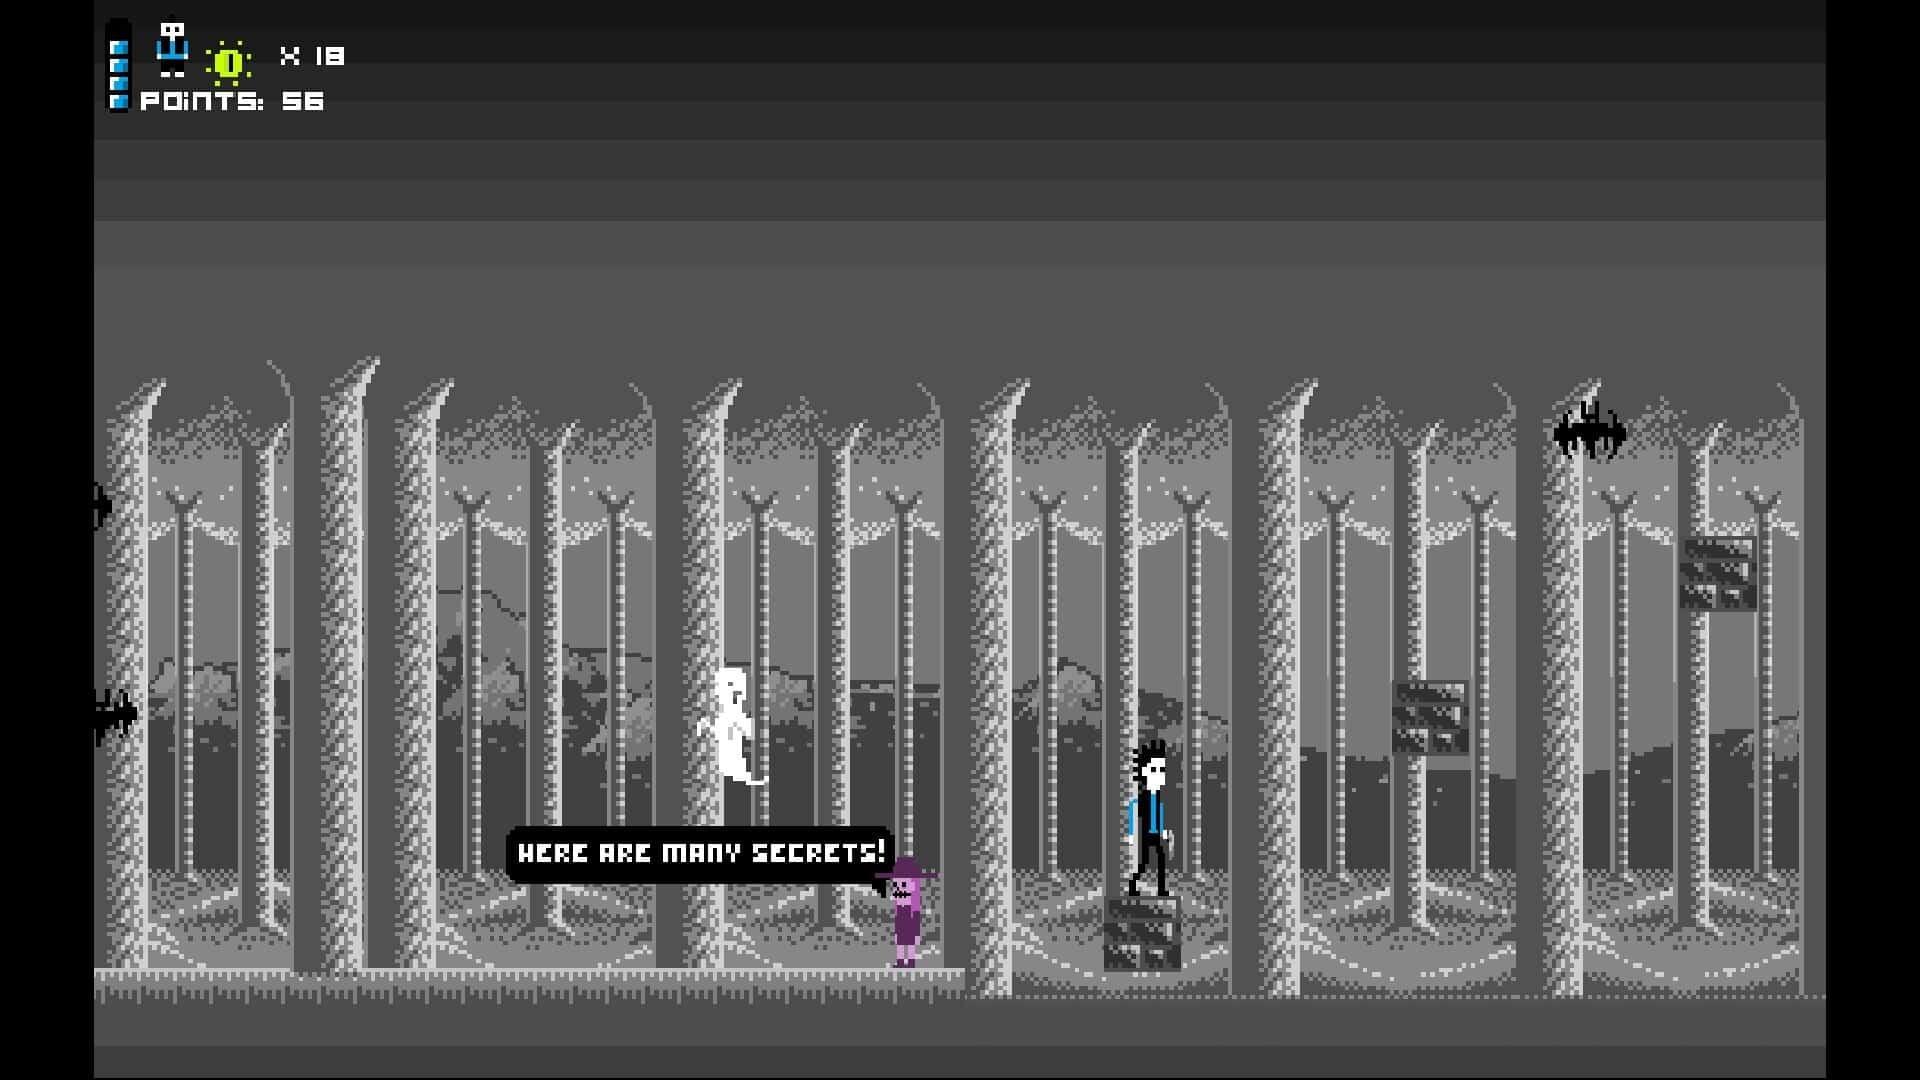 Abo Mando game screenshot, forest